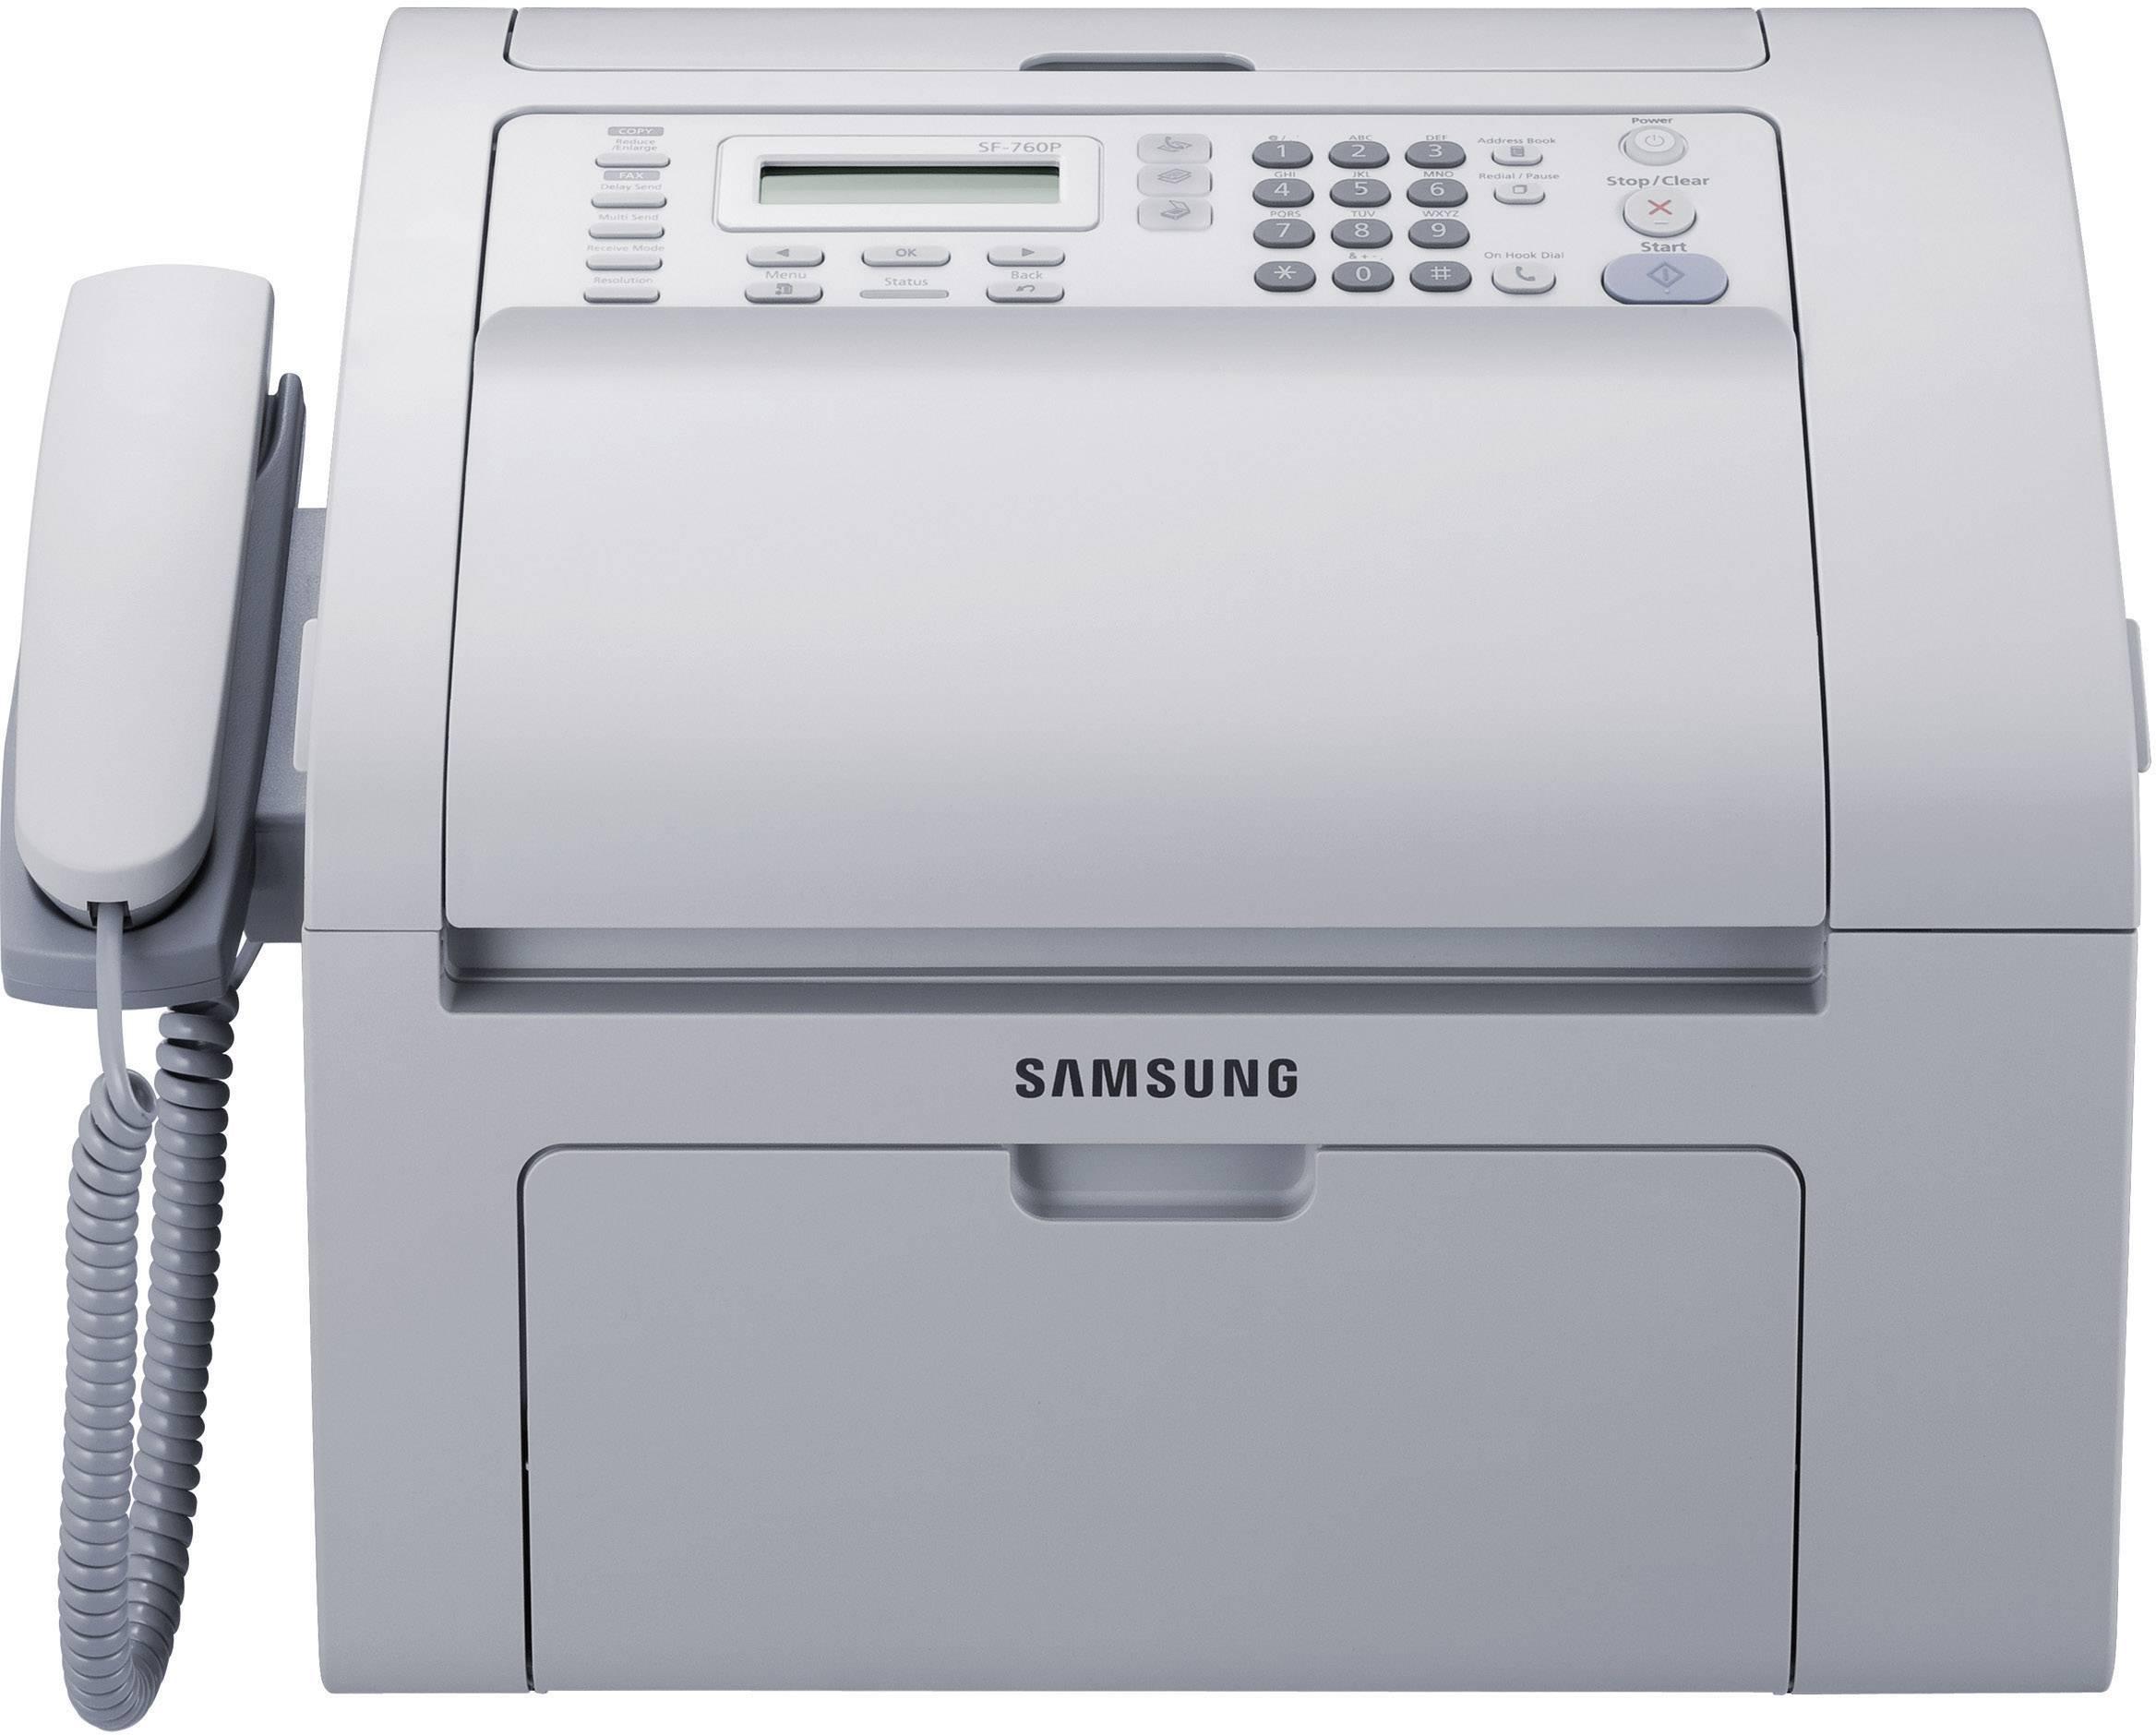 samsung sf 760p laser fax usb 4 in 1 print copy scan fax rh conrad com Samsung Fax Machine Copy Samsung Laser Fax